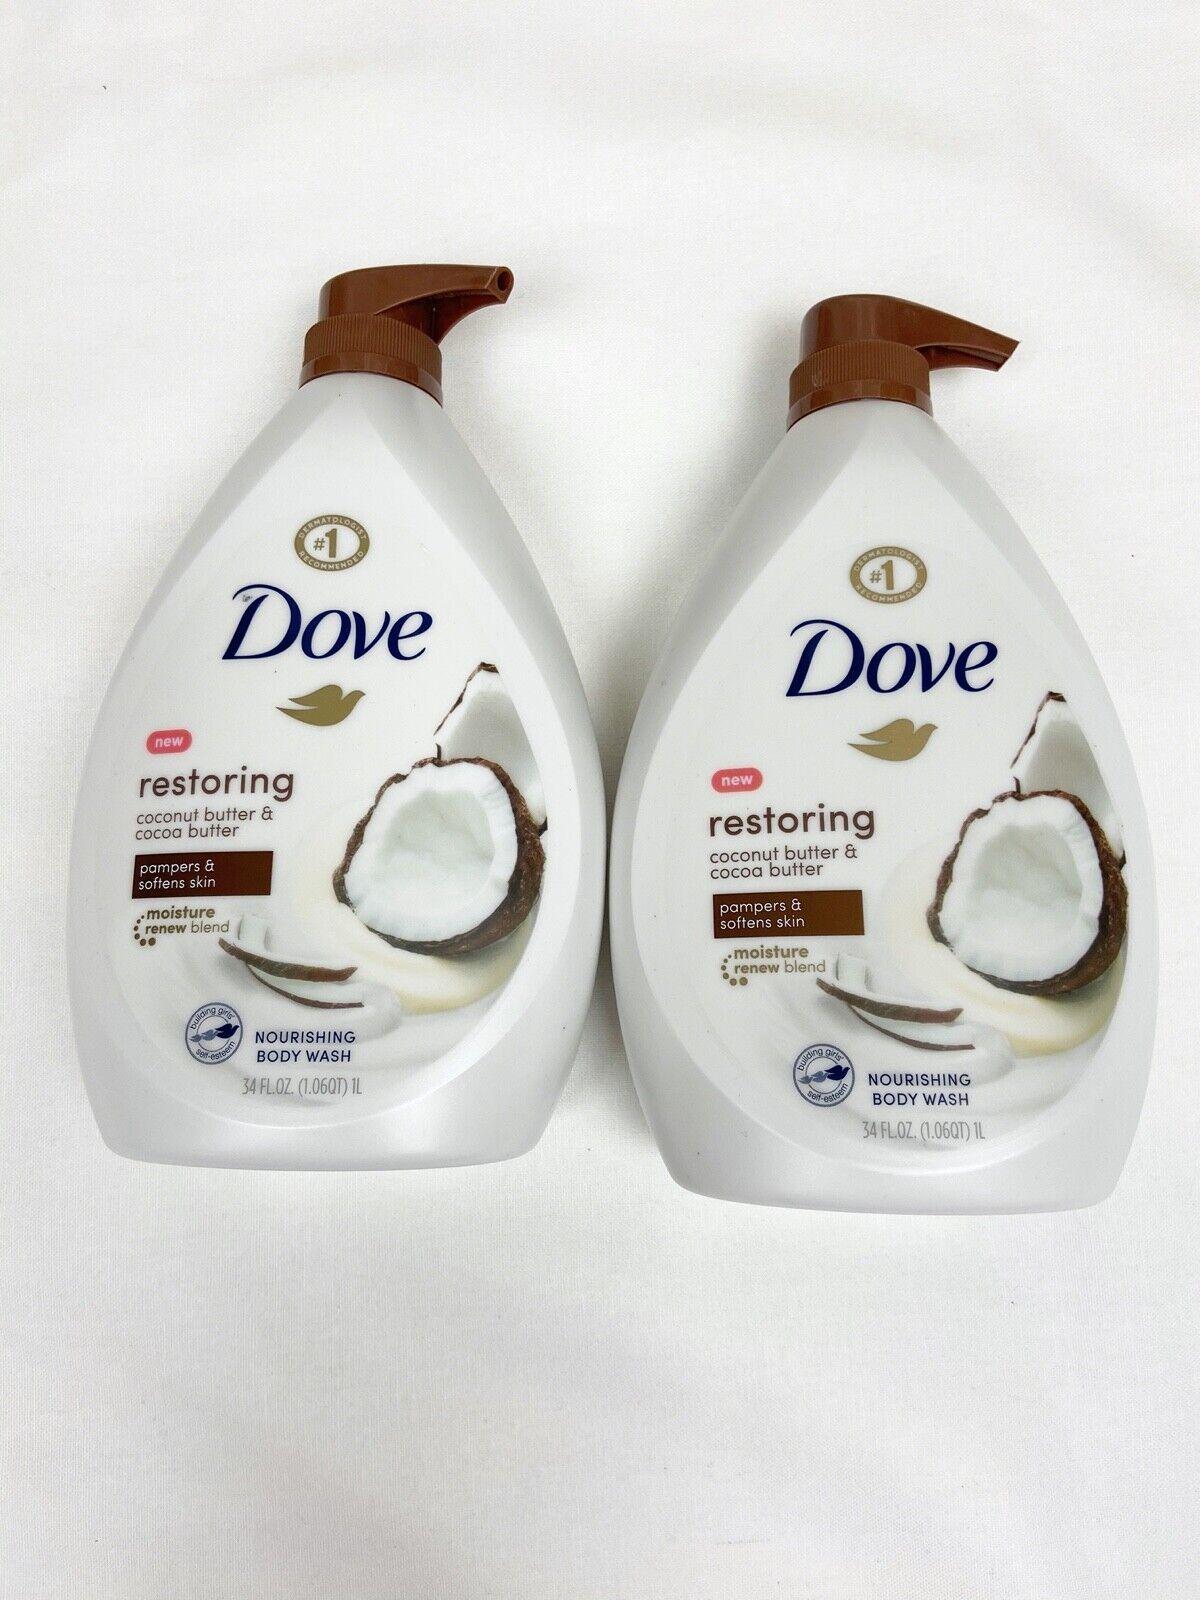 Dove Purely Pampering Body Wash Coconut Milk With Jasmine Petals 34 Oz For Sale Online Ebay